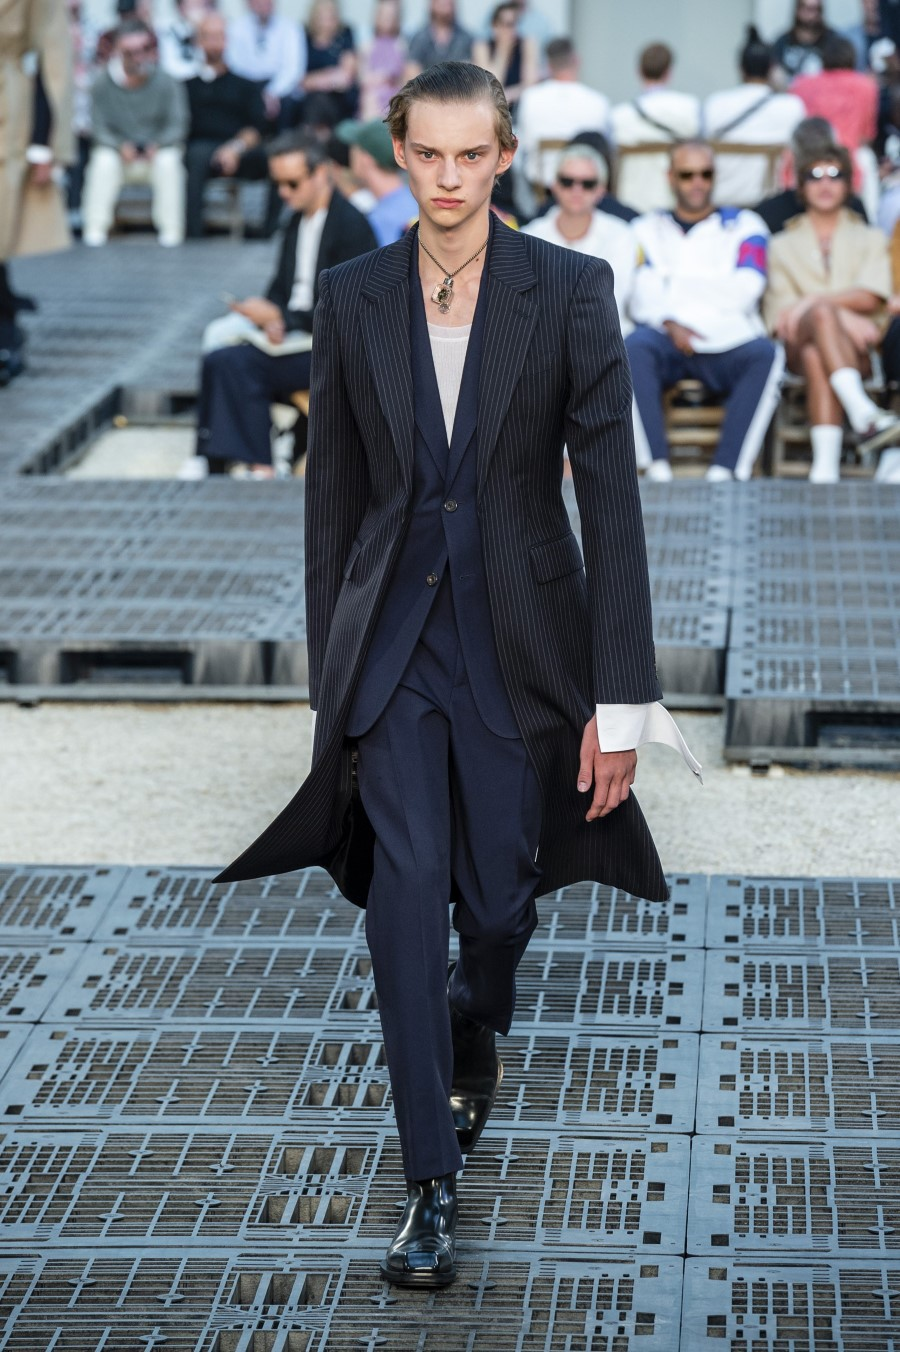 Alexander McQueen Printemps/été 2019 - Paris Fashion Week